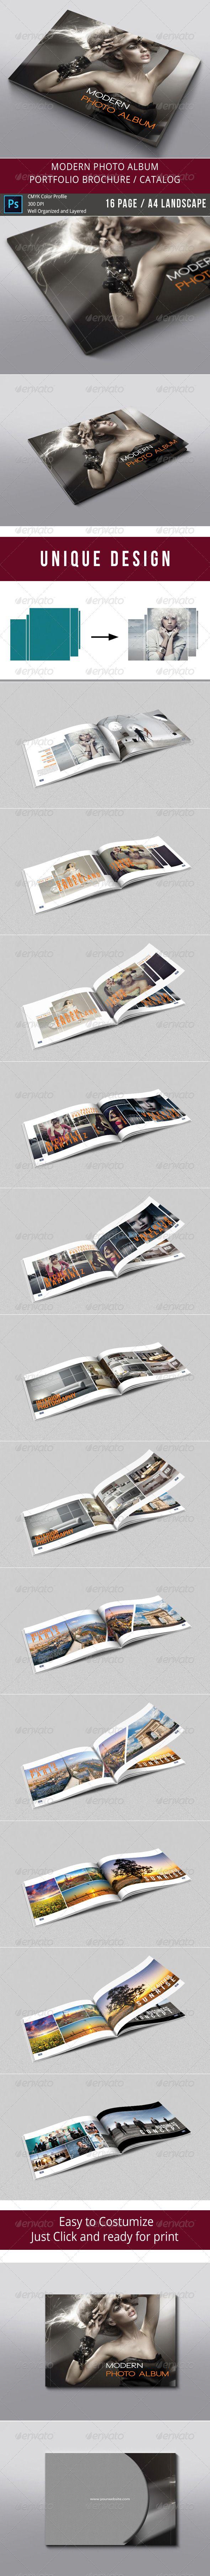 Modern Photo Album Template #albumtemplate Download: http://graphicriver.net/item/modern-photo-album/8026411?ref=ksioks